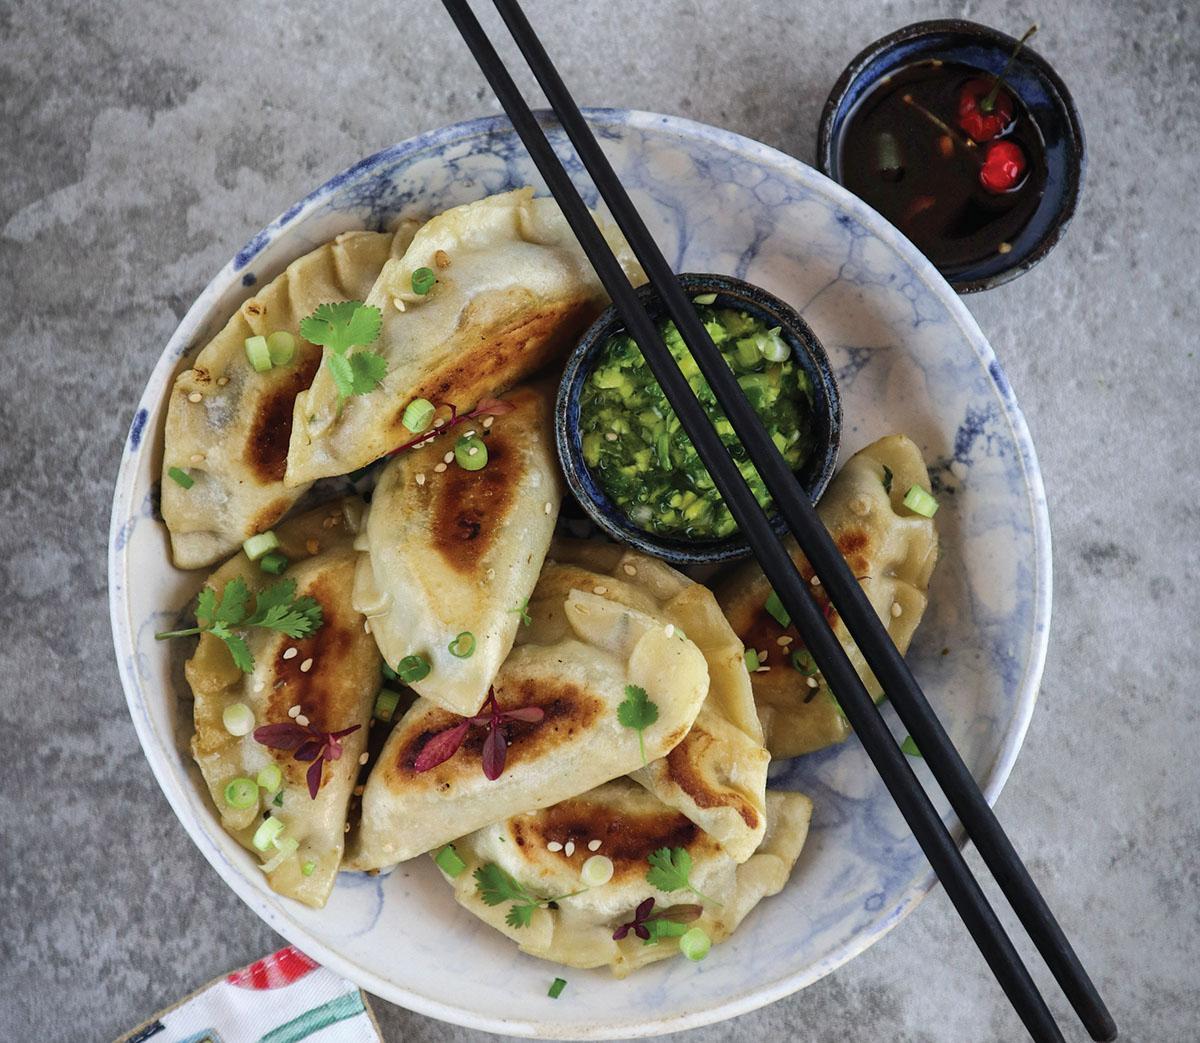 New Year's Dumplings